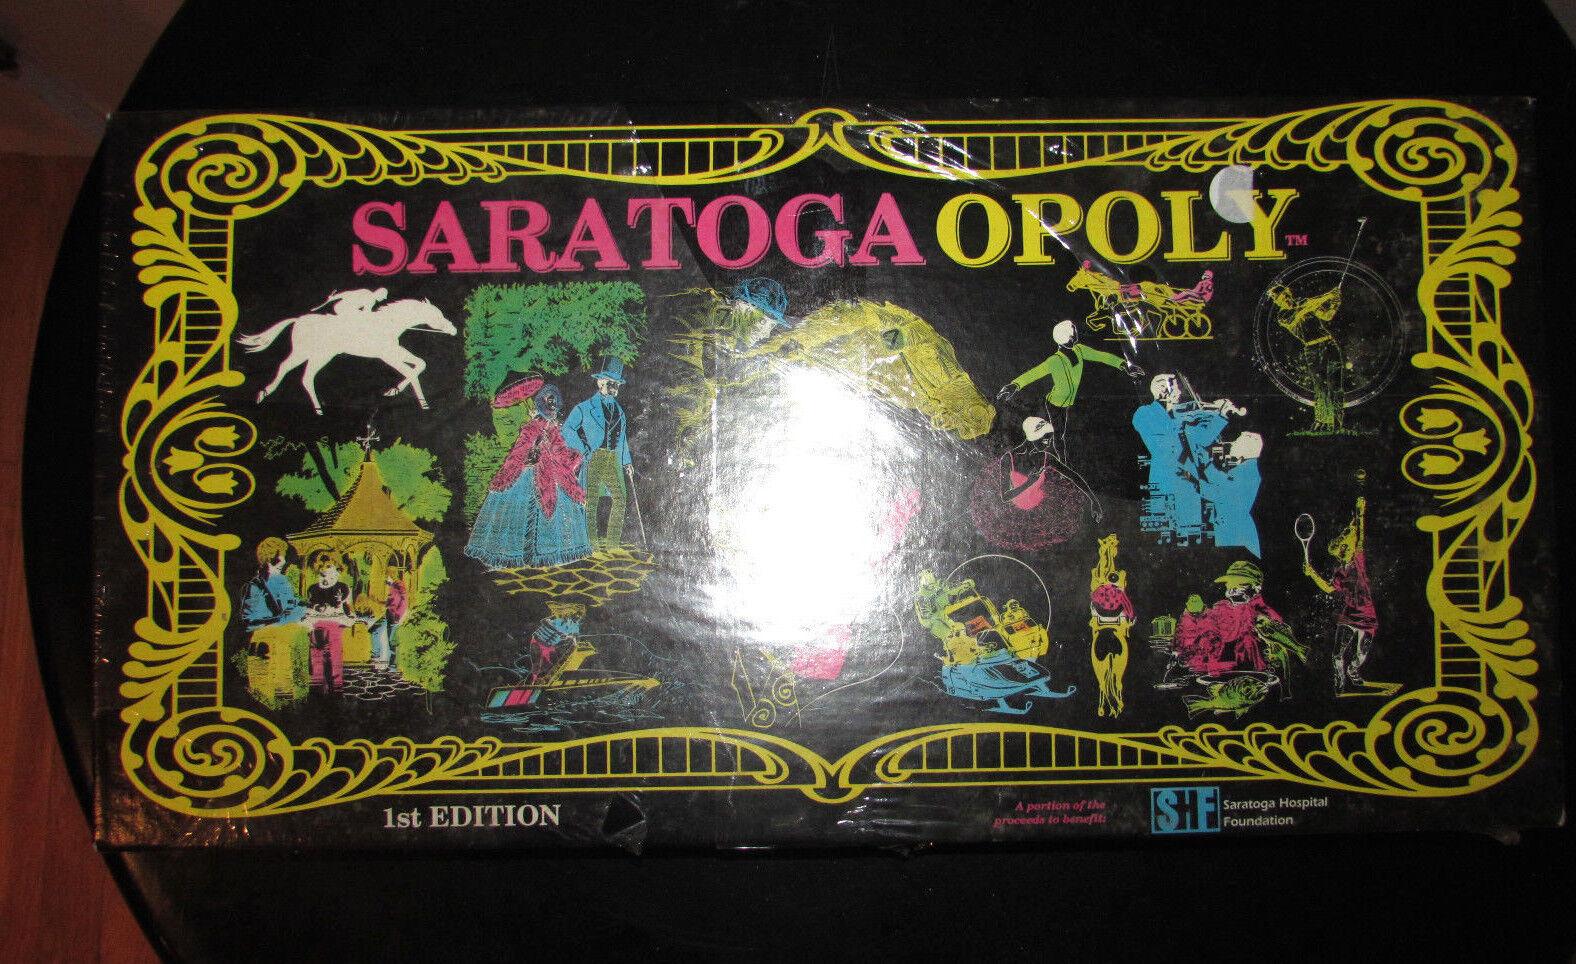 NEW SARATOGAOPOLY SARATOGA MONOPOLY BOARD GAME 1984 UPSTATE NY 1ST EDITION